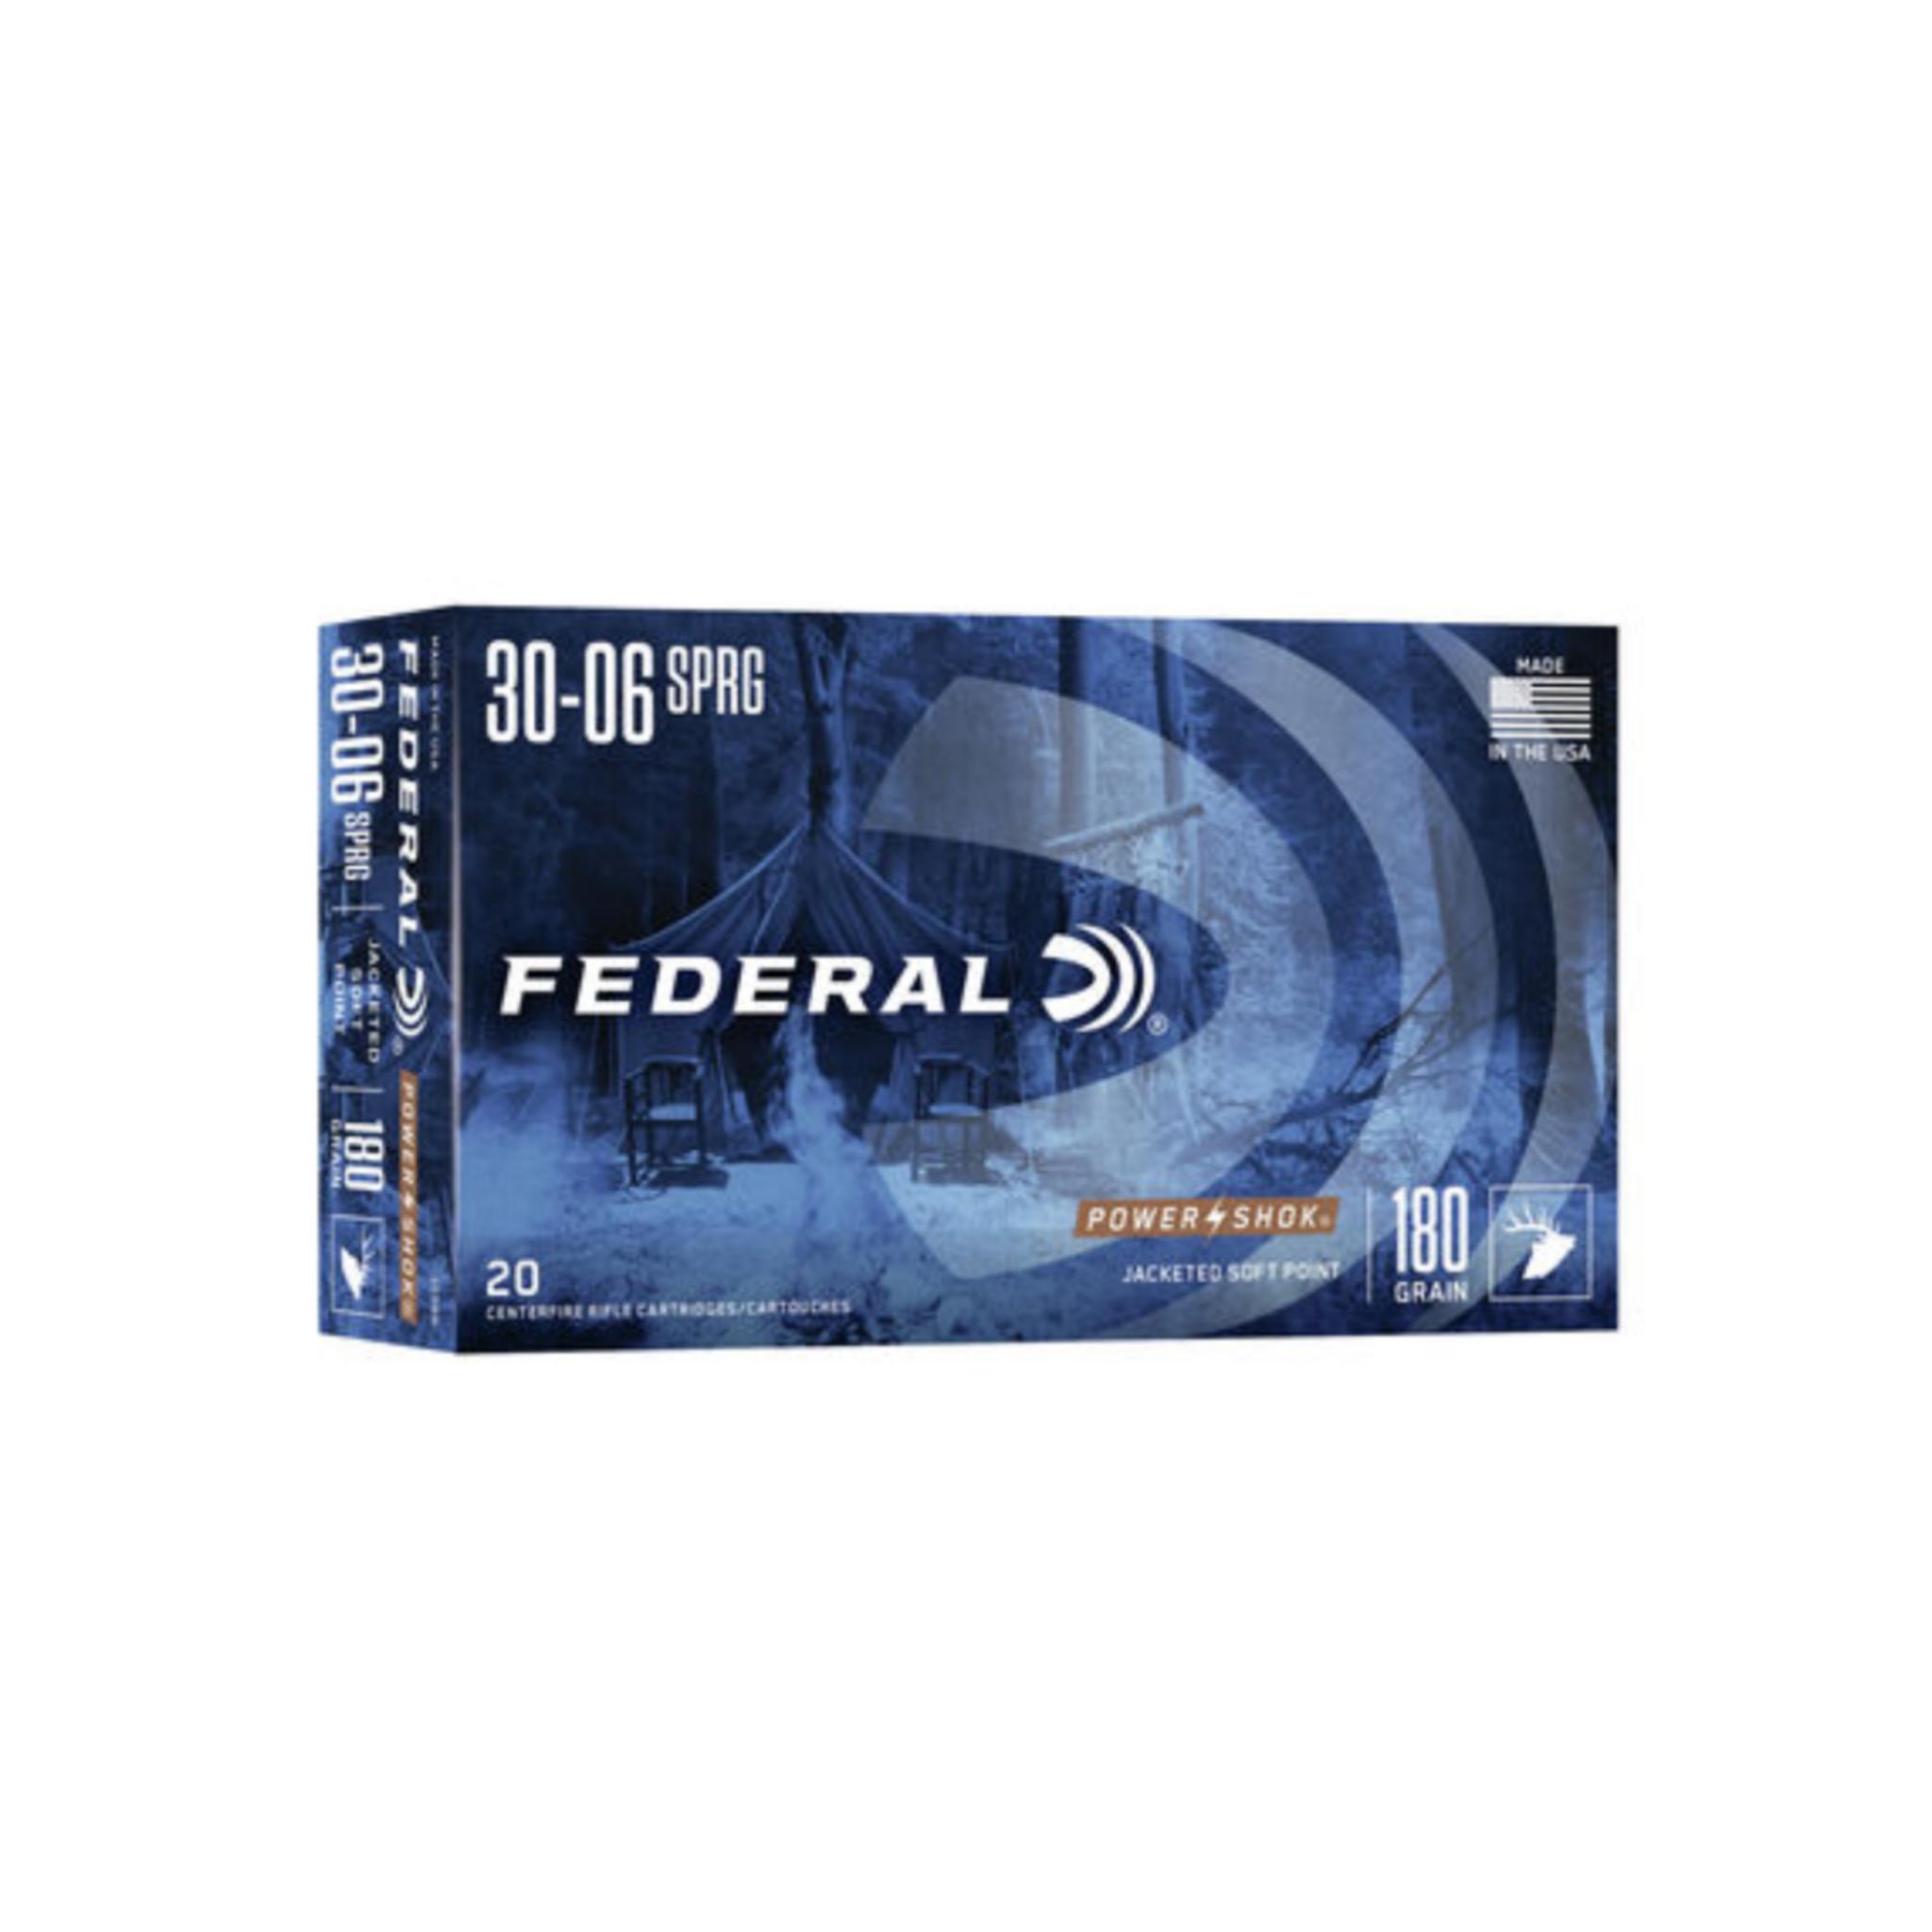 Federal .30-06 SPRG Power-Shok 180gr Soft Point